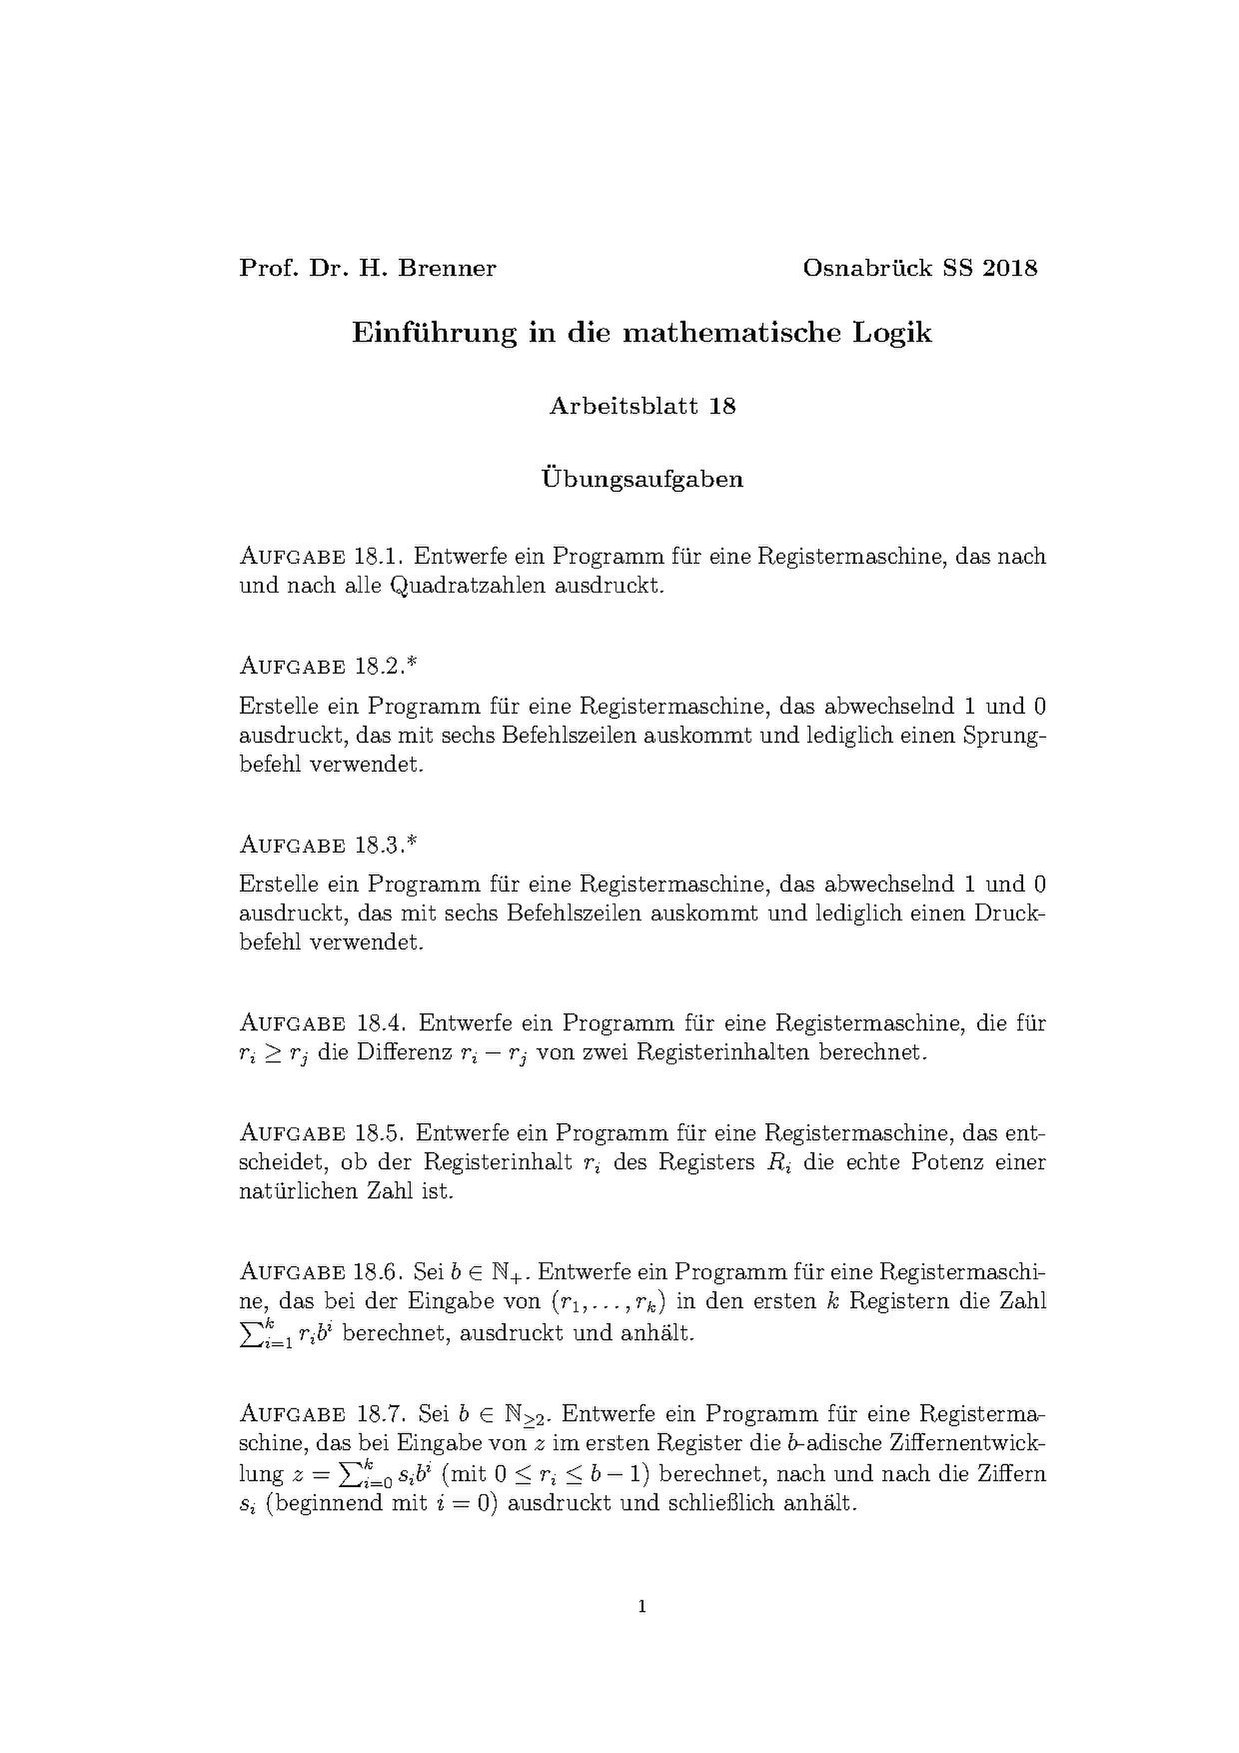 Tolle Muskelsystemdiagramm Arbeitsblatt Fotos - Anatomie Ideen ...